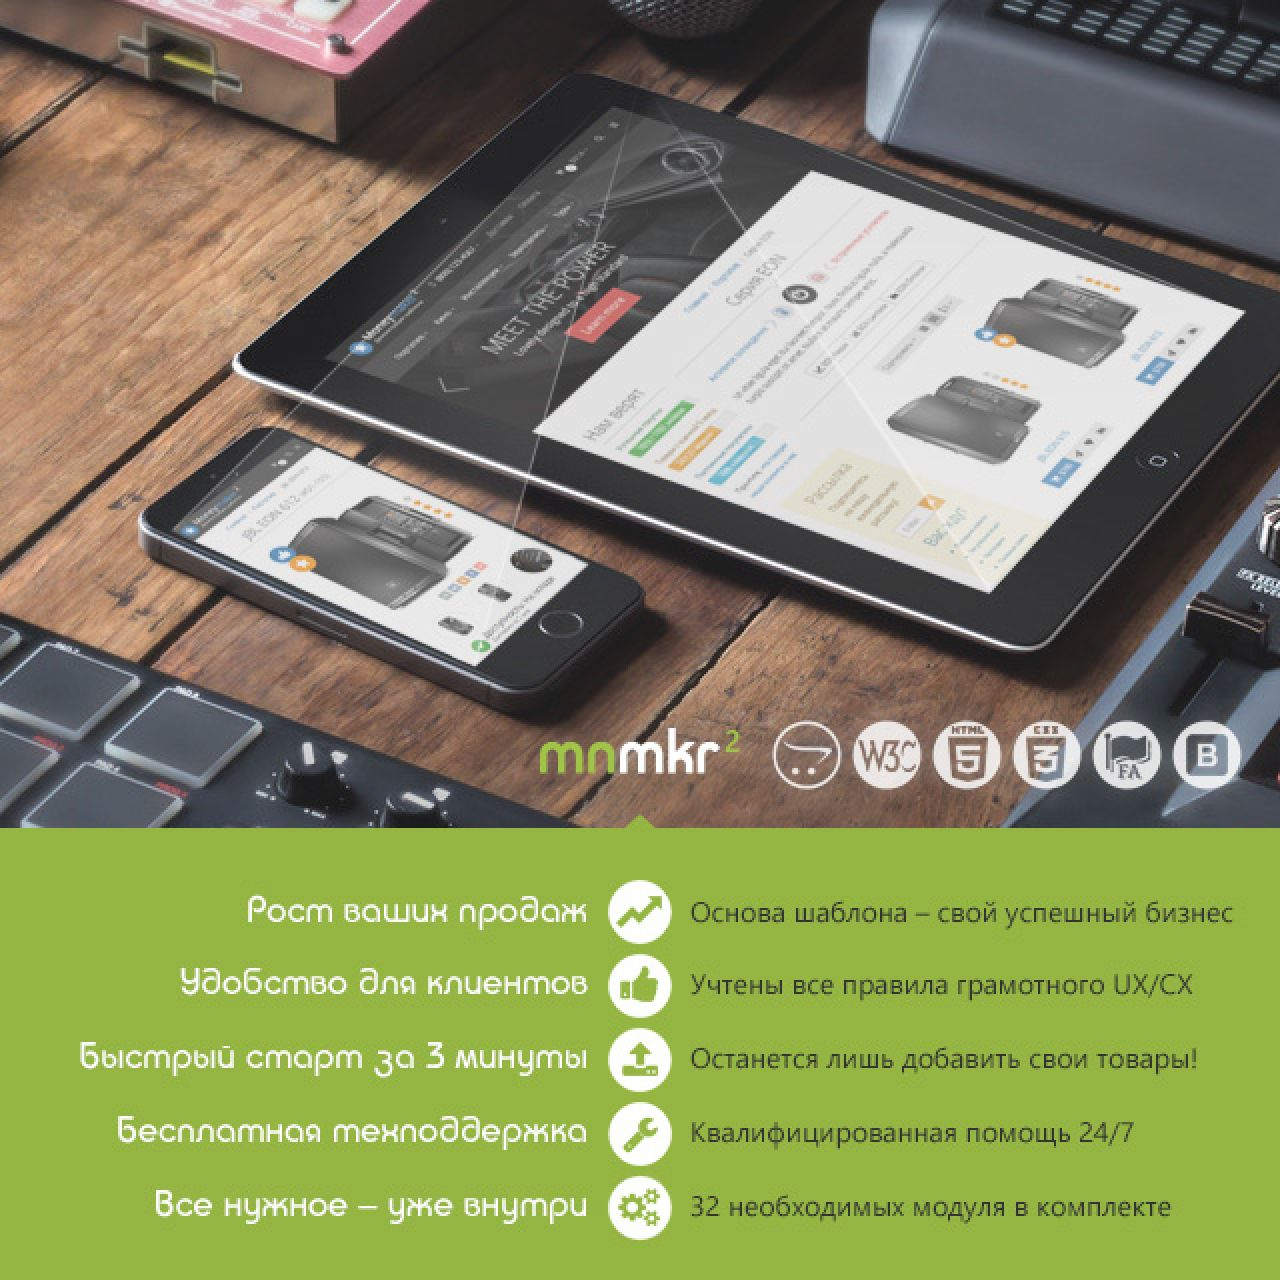 Moneymaker 2 - адаптивный, продающий шаблон для ocStore Opencart 2.x из  категории d3f8bb96e5b